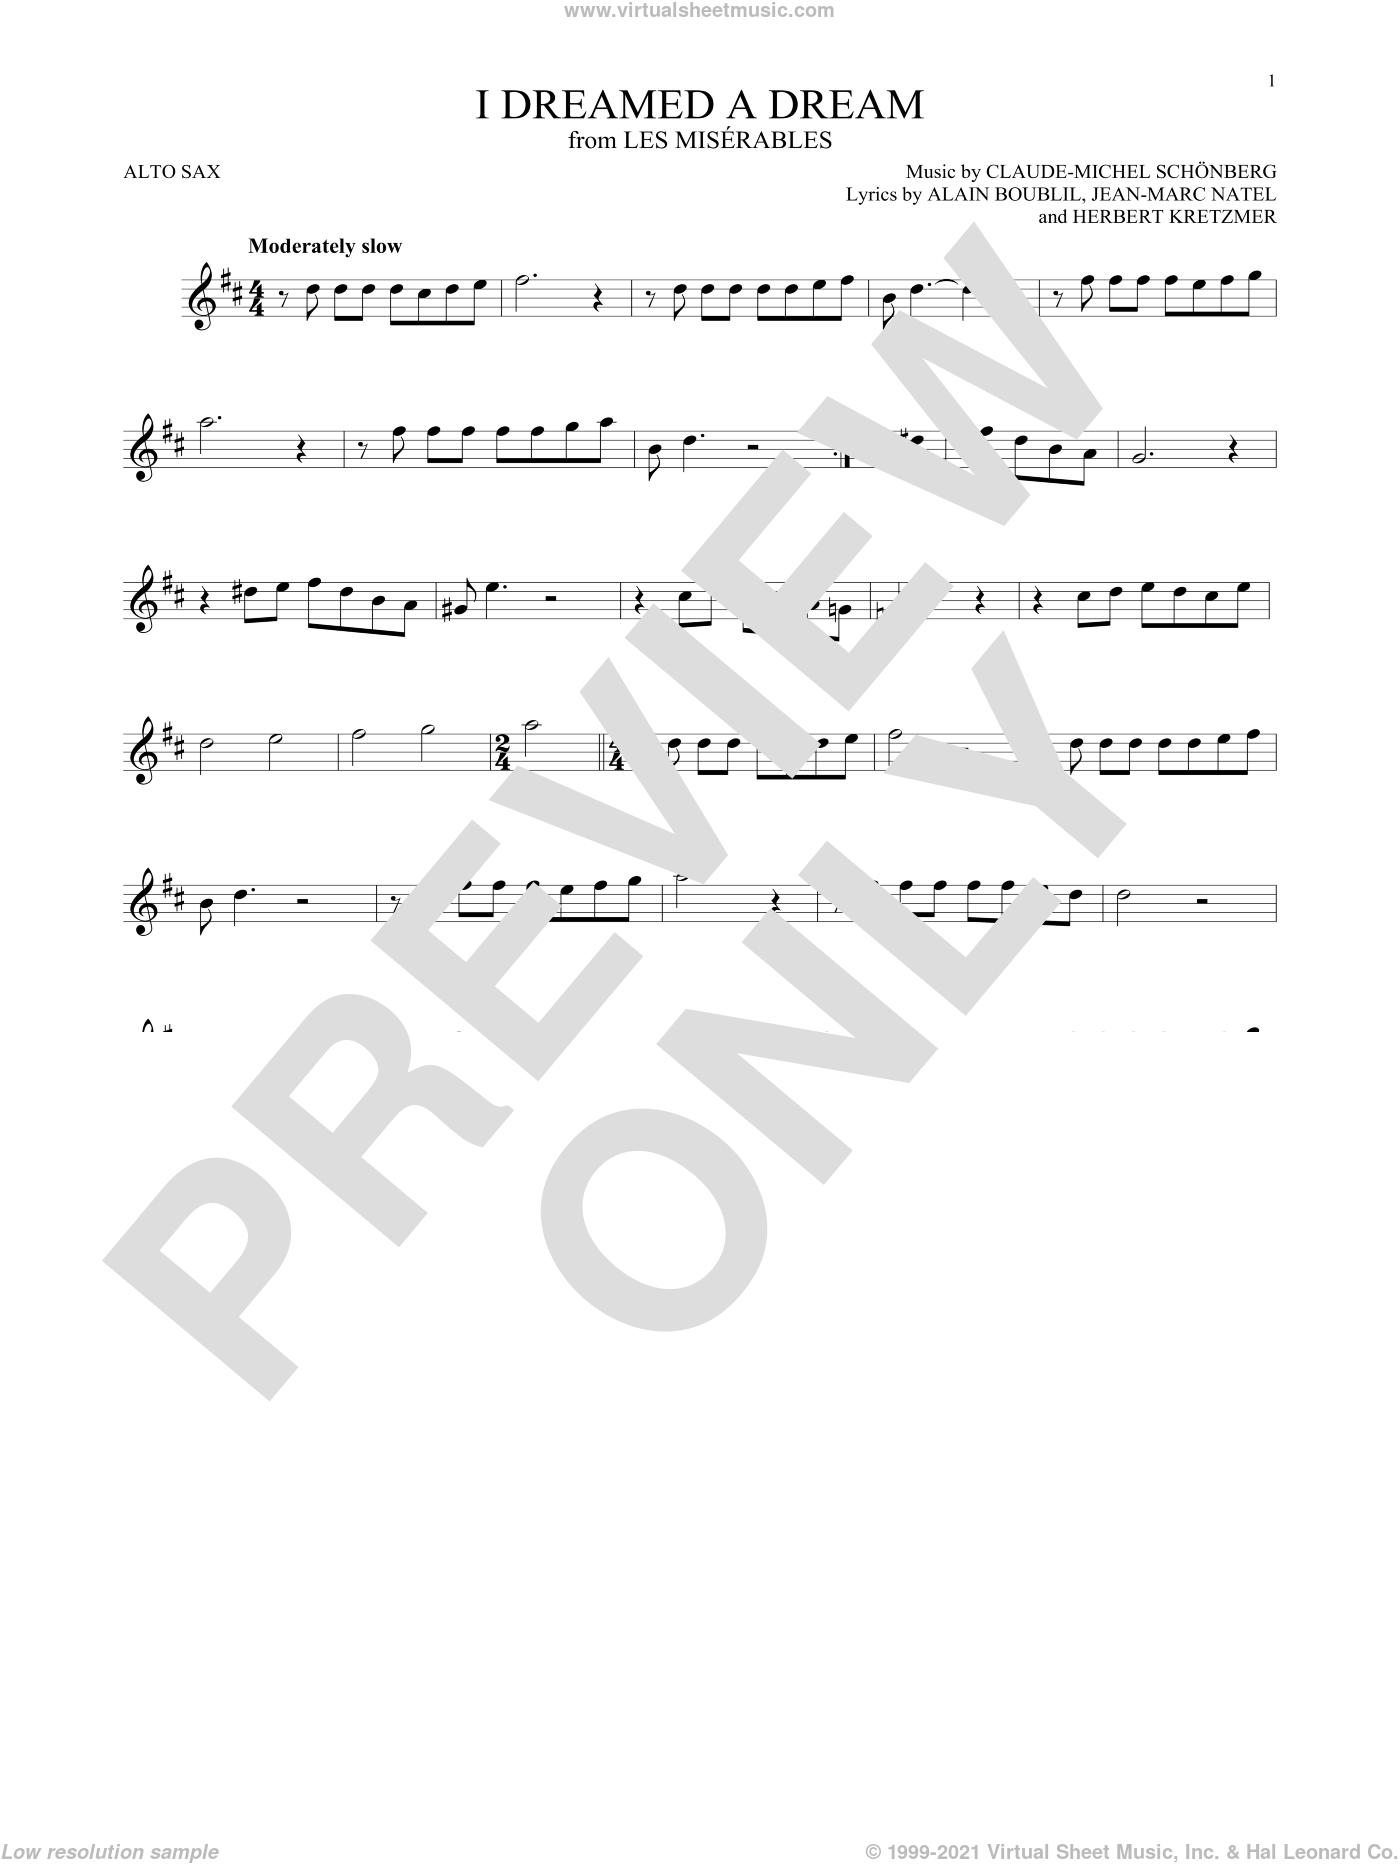 I Dreamed A Dream sheet music for alto saxophone solo by Claude-Michel Schonberg, intermediate skill level